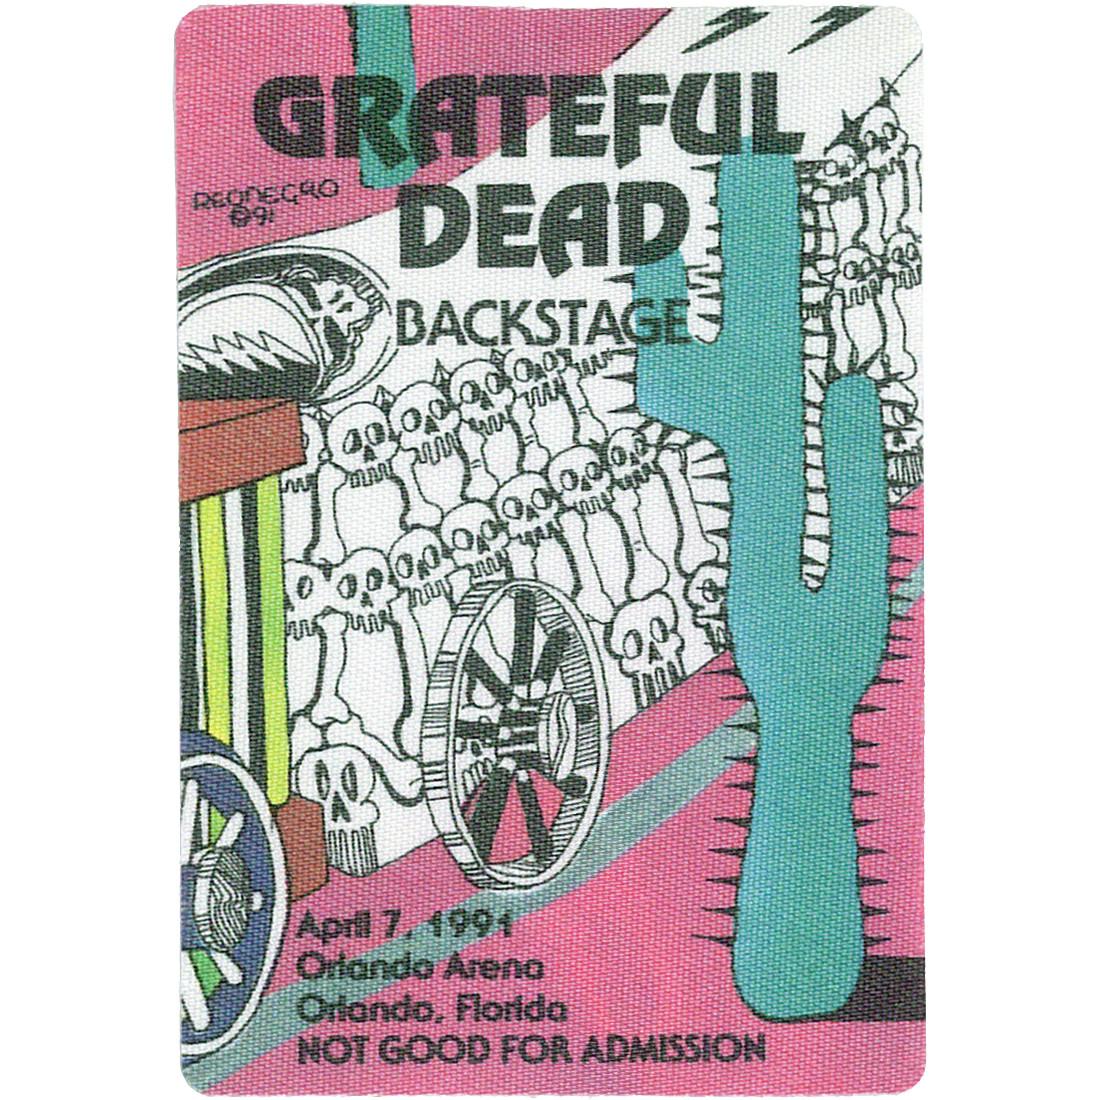 Grateful Dead 1991 04-07 Backstage Pass